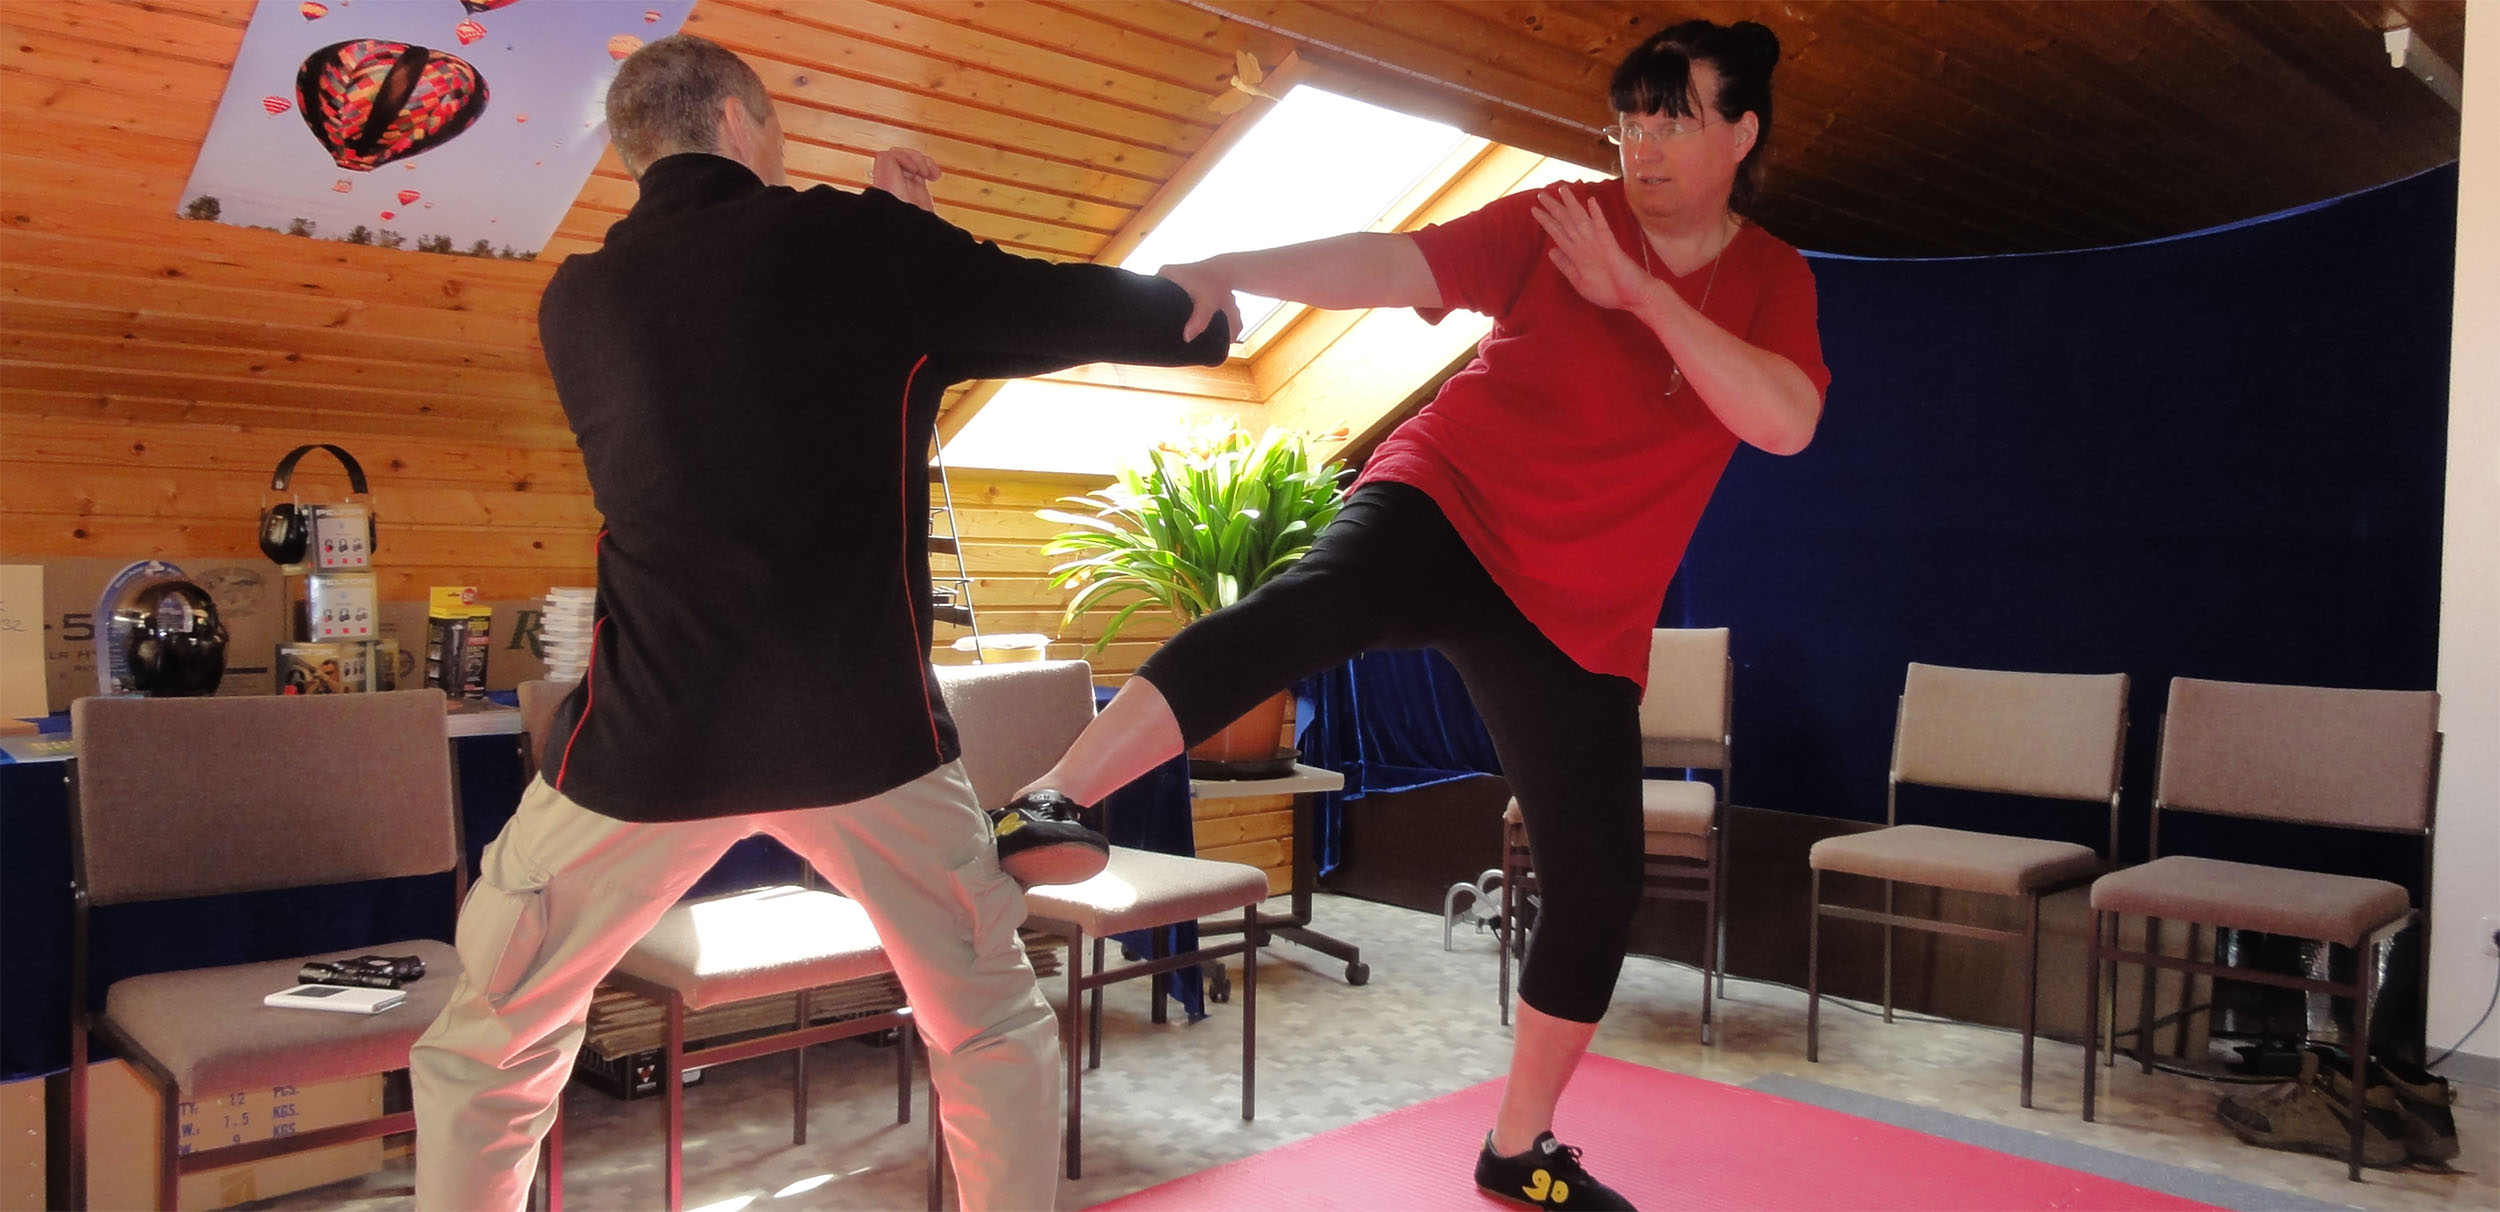 Kampfkunst Training